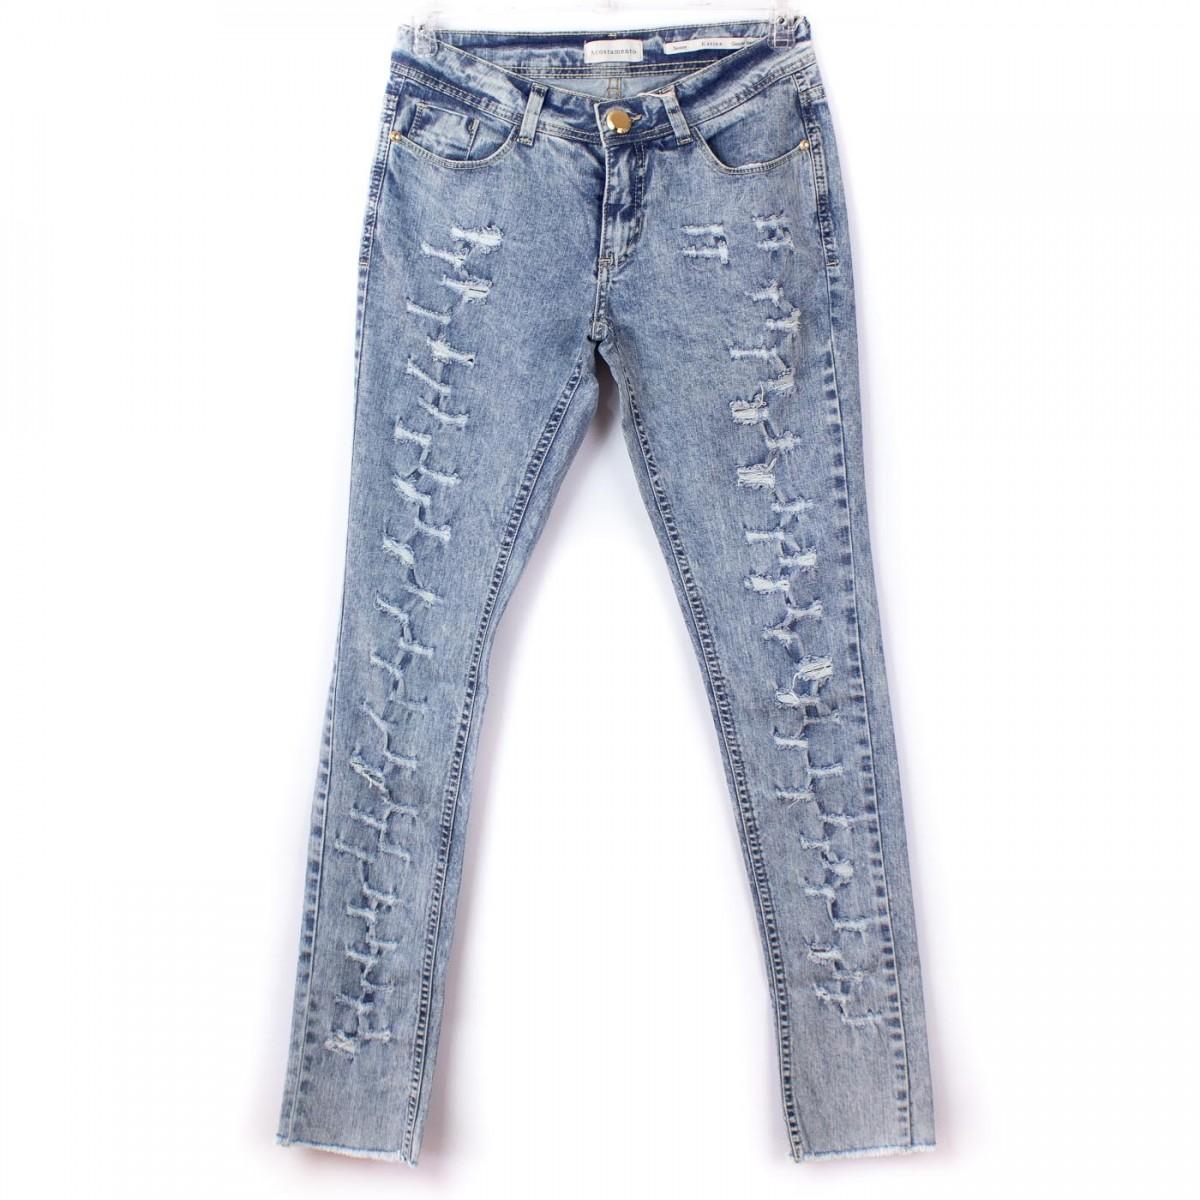 Bizz Store - Calça Jeans Feminina Acostamento Destroyed Skinny fd5015b1c3b